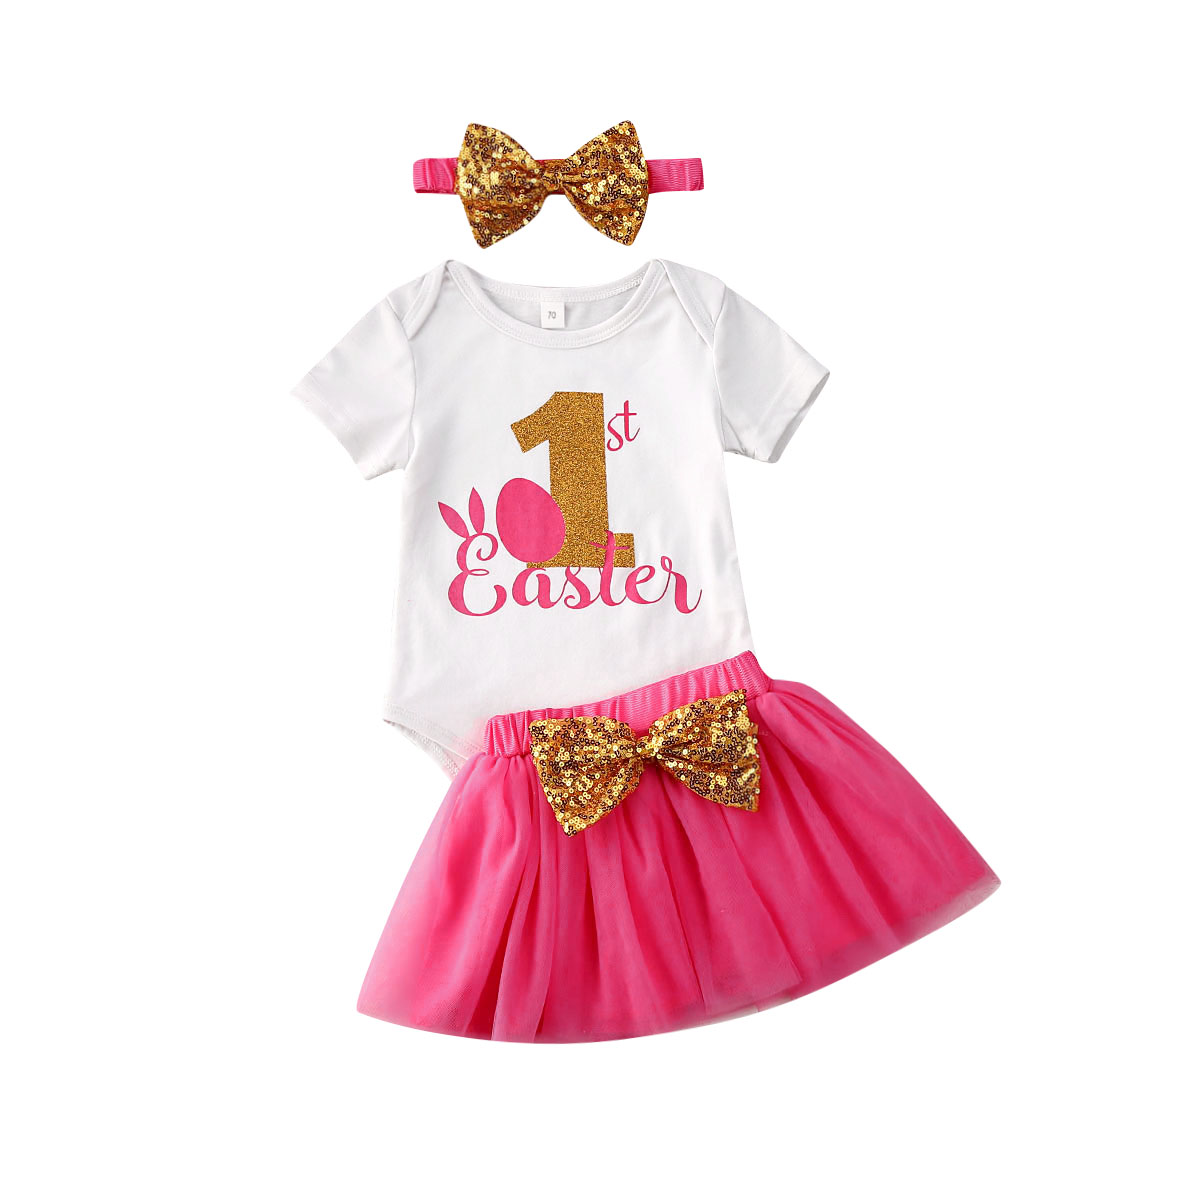 3pcs Baby Girl Clothes Easter 1st Birthday Outfit Party Clothes Romper Cake Tutu Dress Set 0 24m Walmart Com Walmart Com